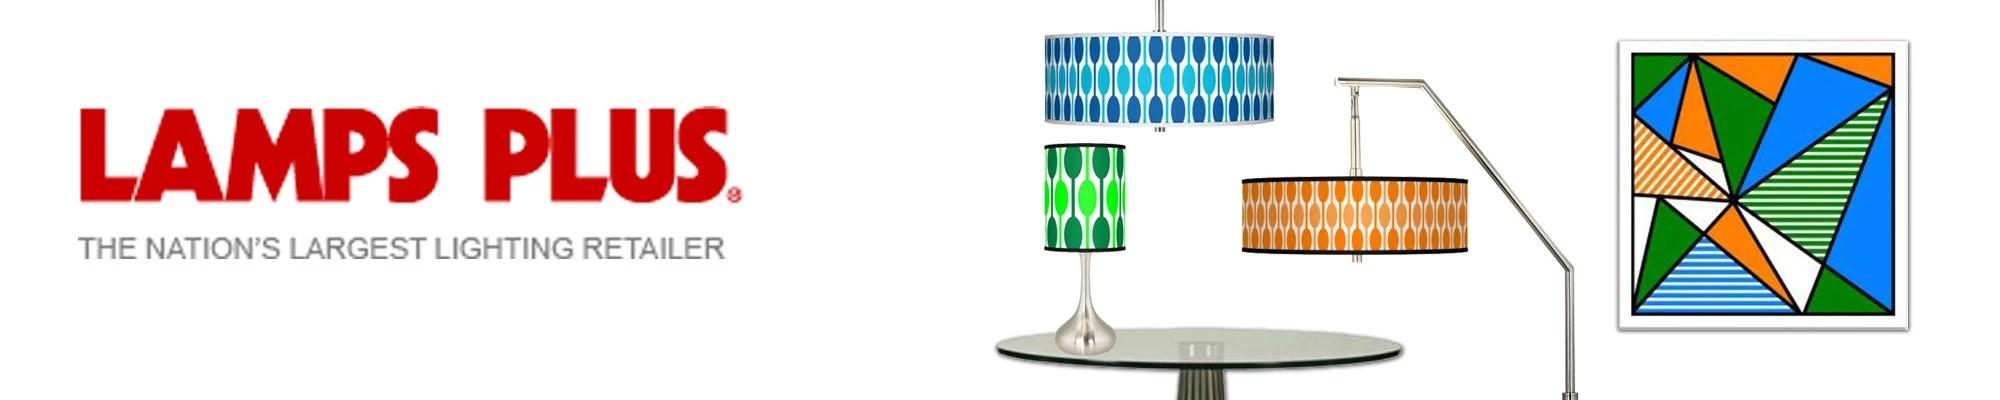 lamp-plus-banner